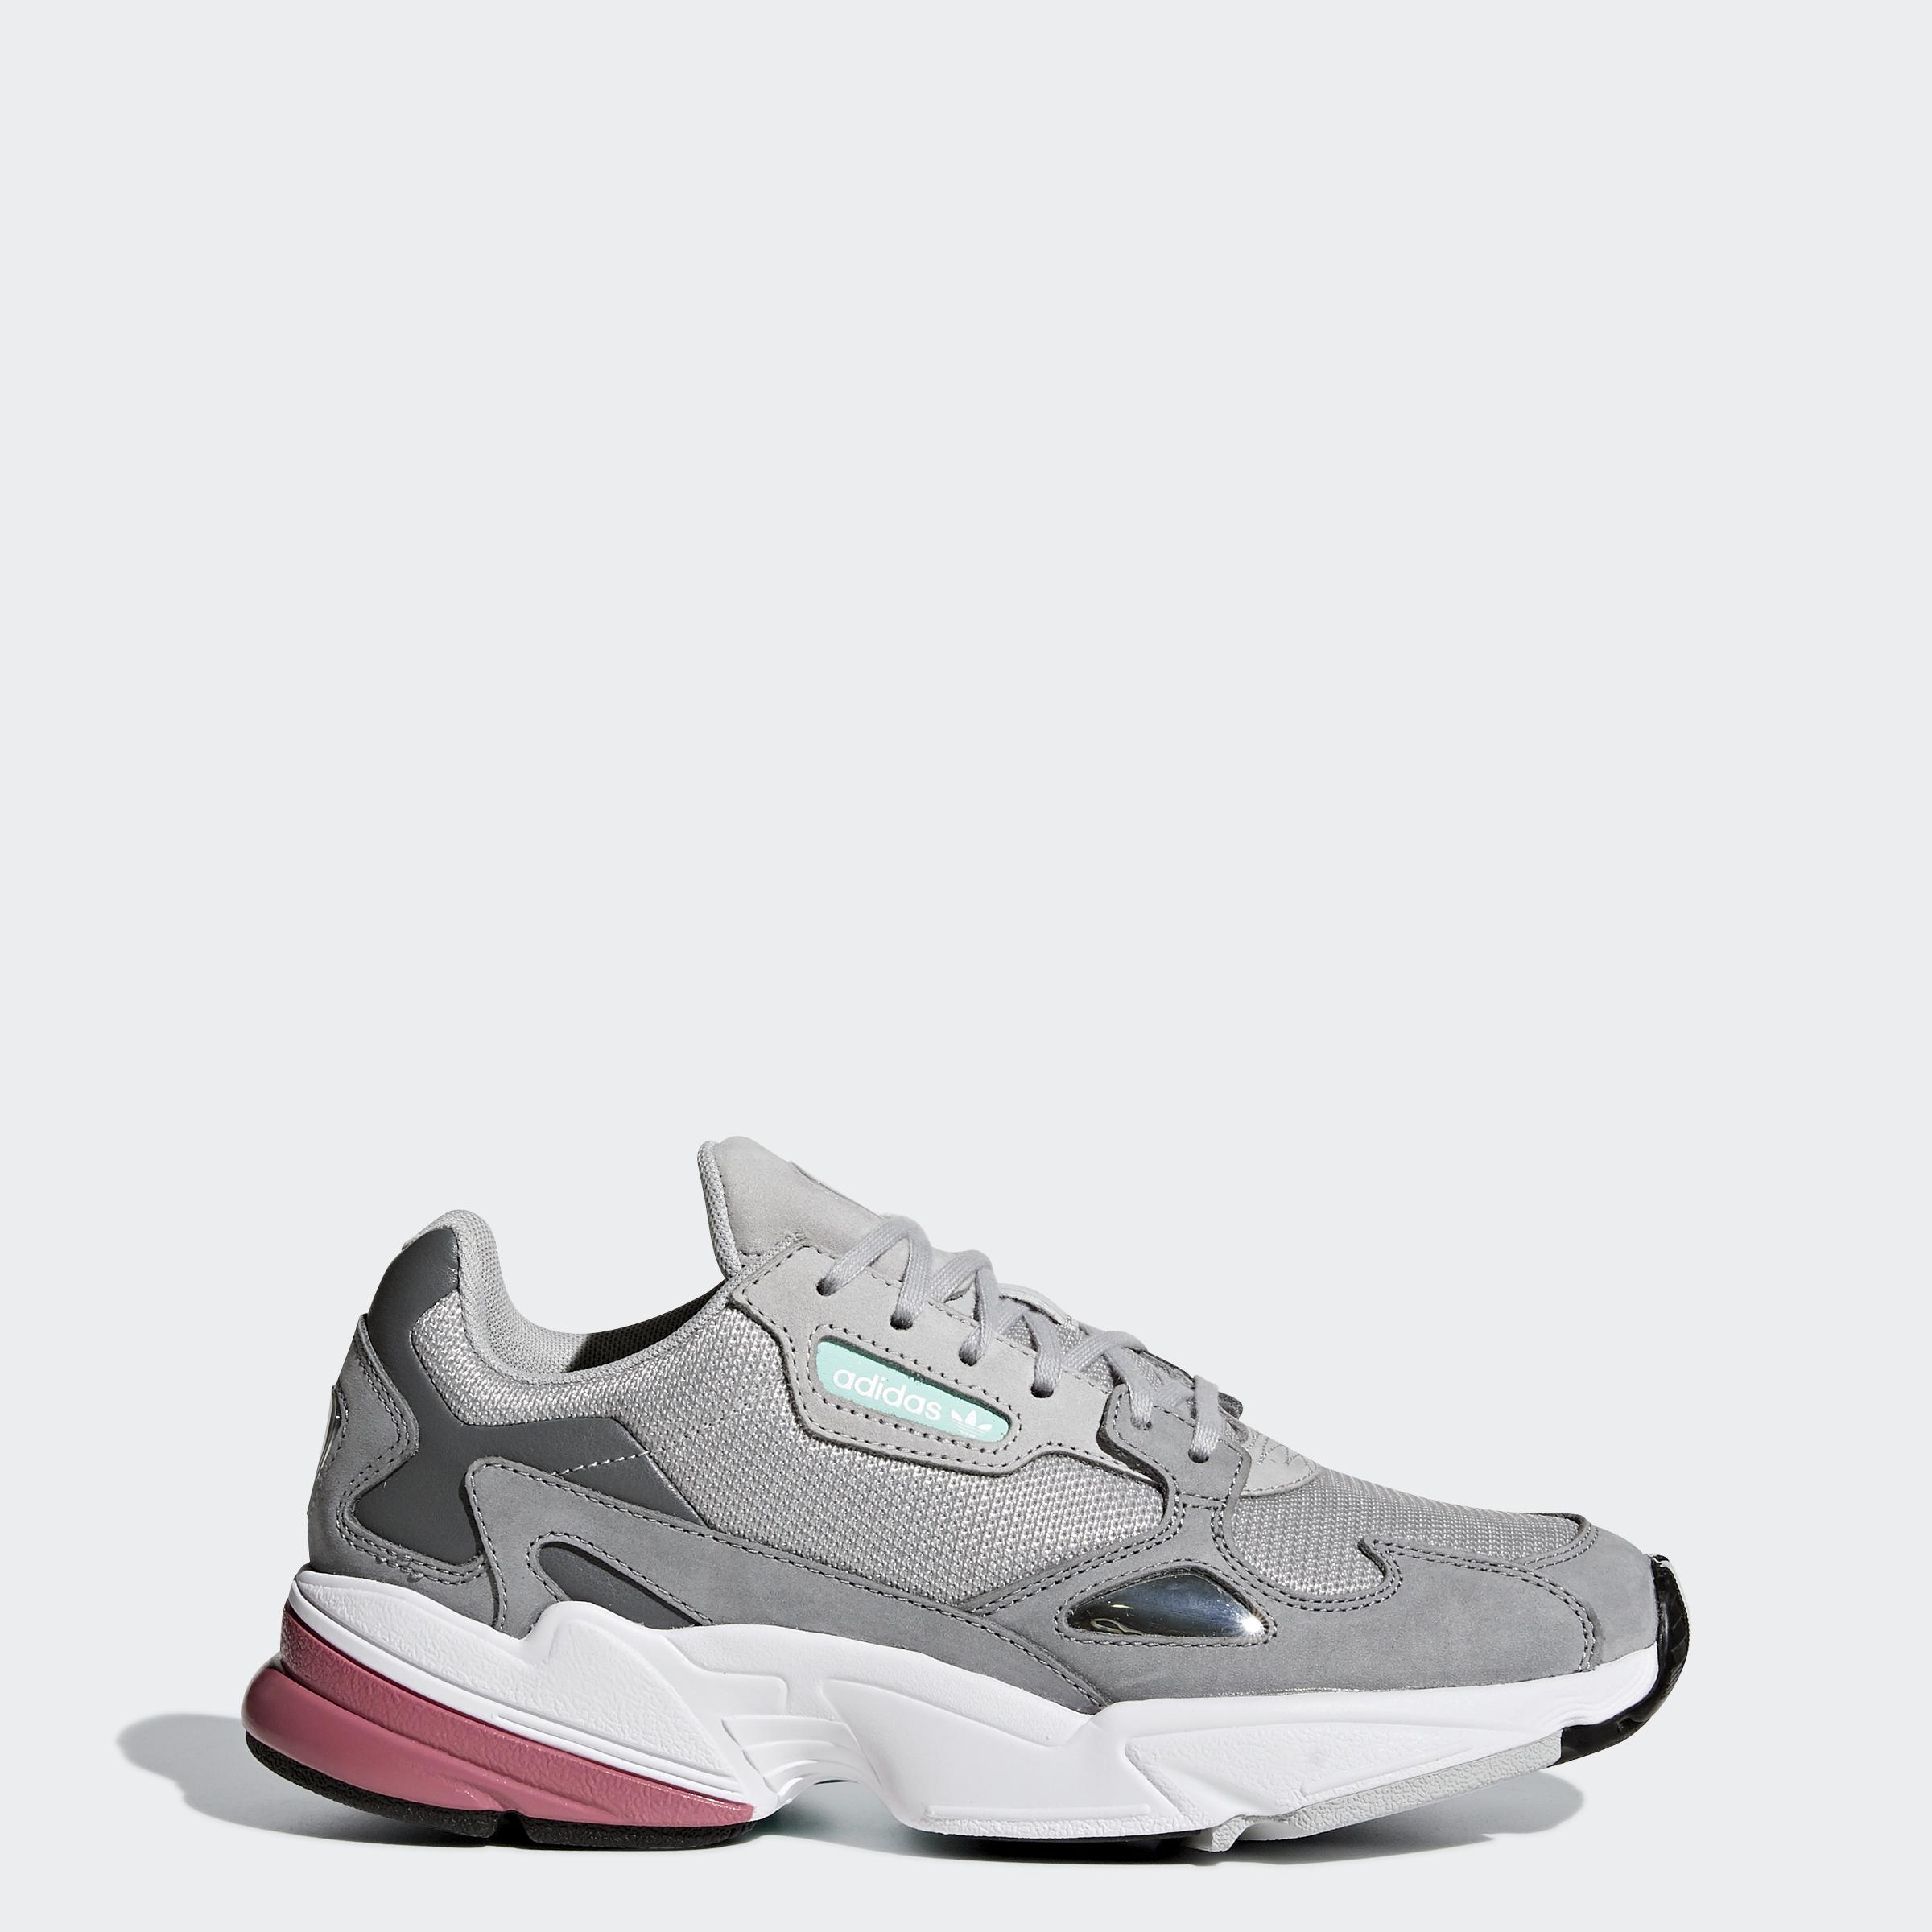 adidas-Originals-Falcon-Shoes-Women-039-s thumbnail 28